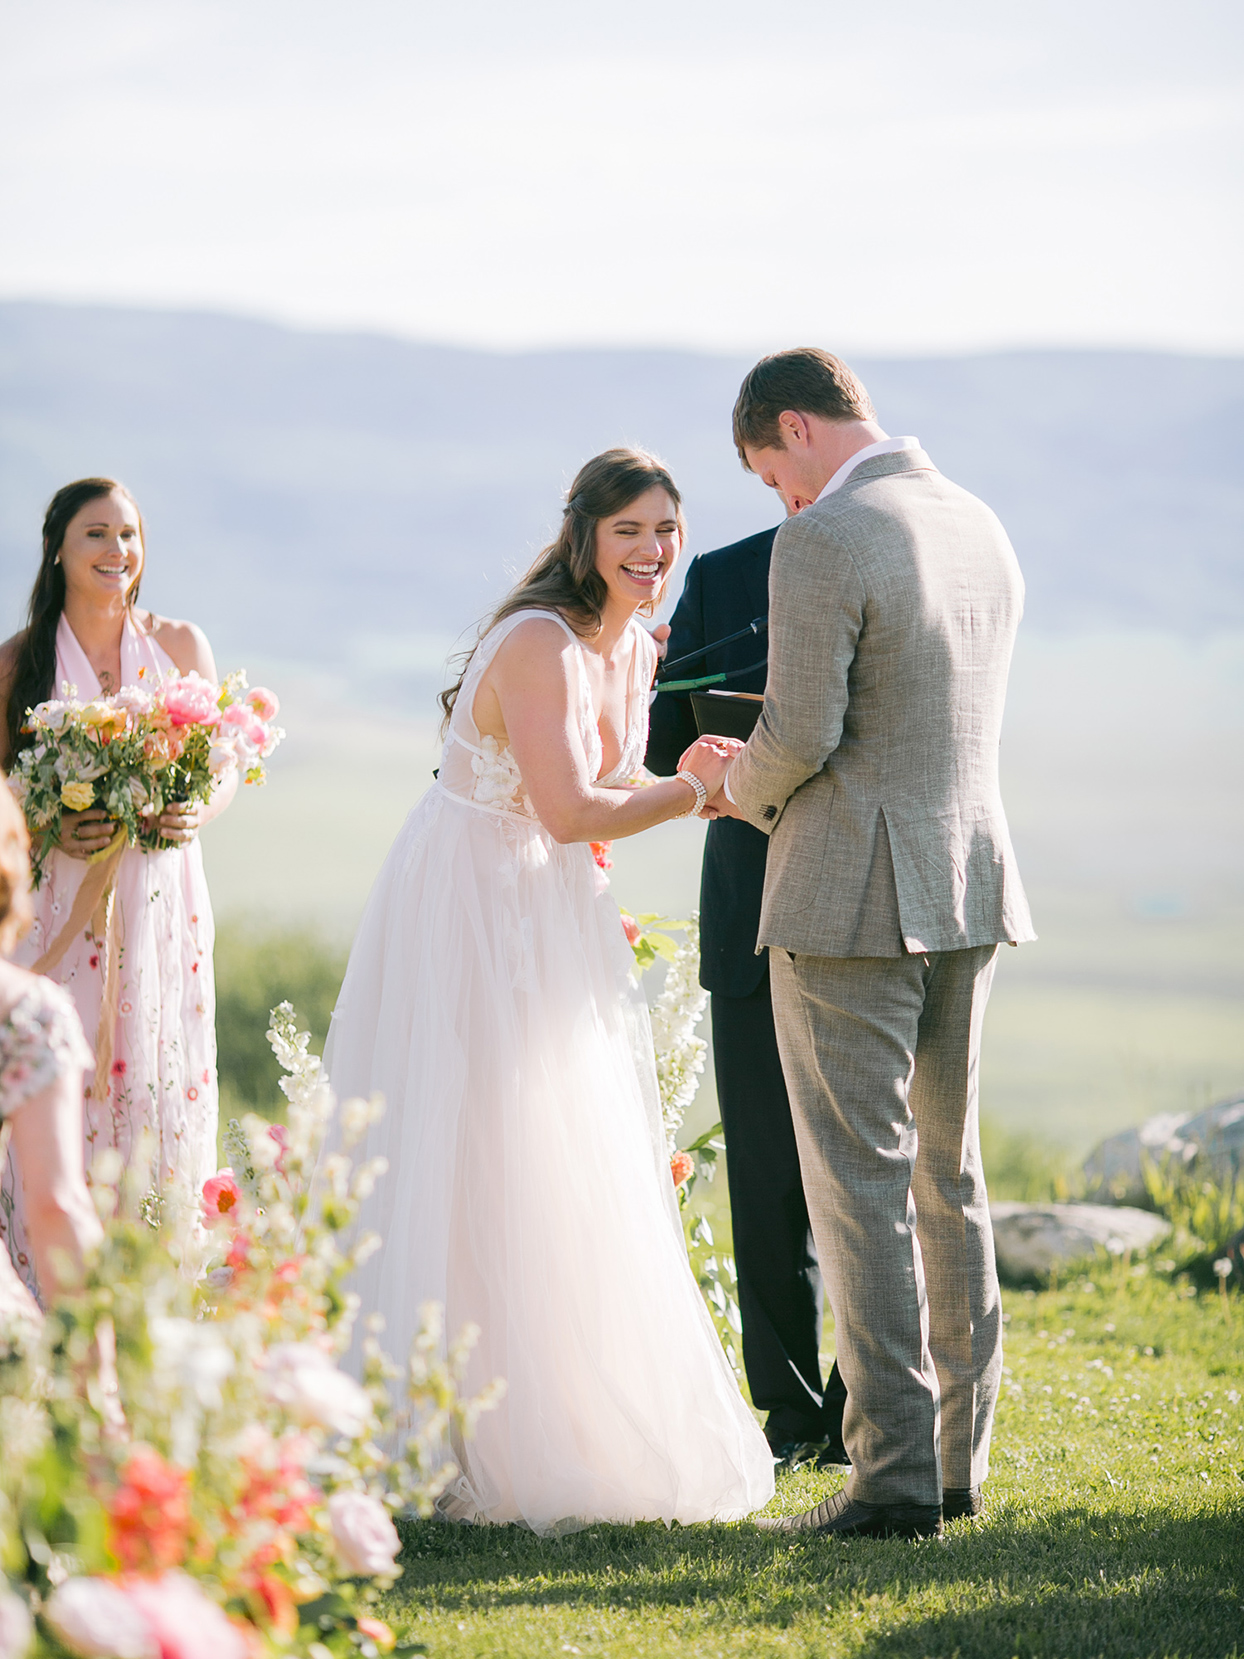 logan conor wedding ceremony couple laughing